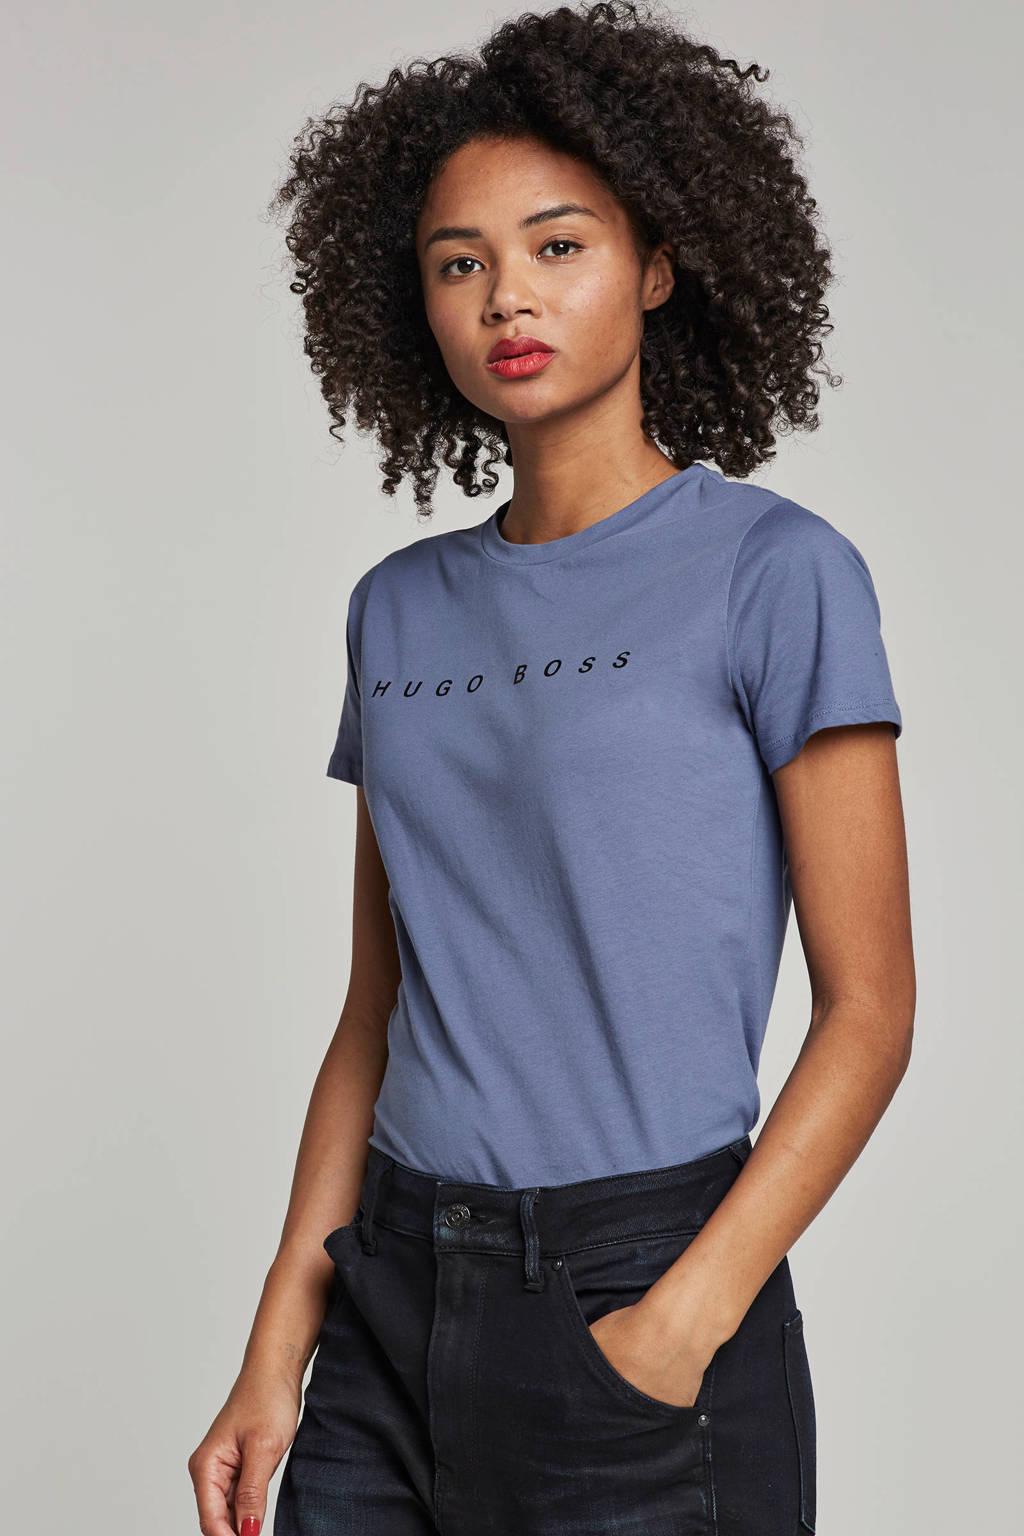 Boss Casual T-shirt met logo opdruk, Lichtblauw